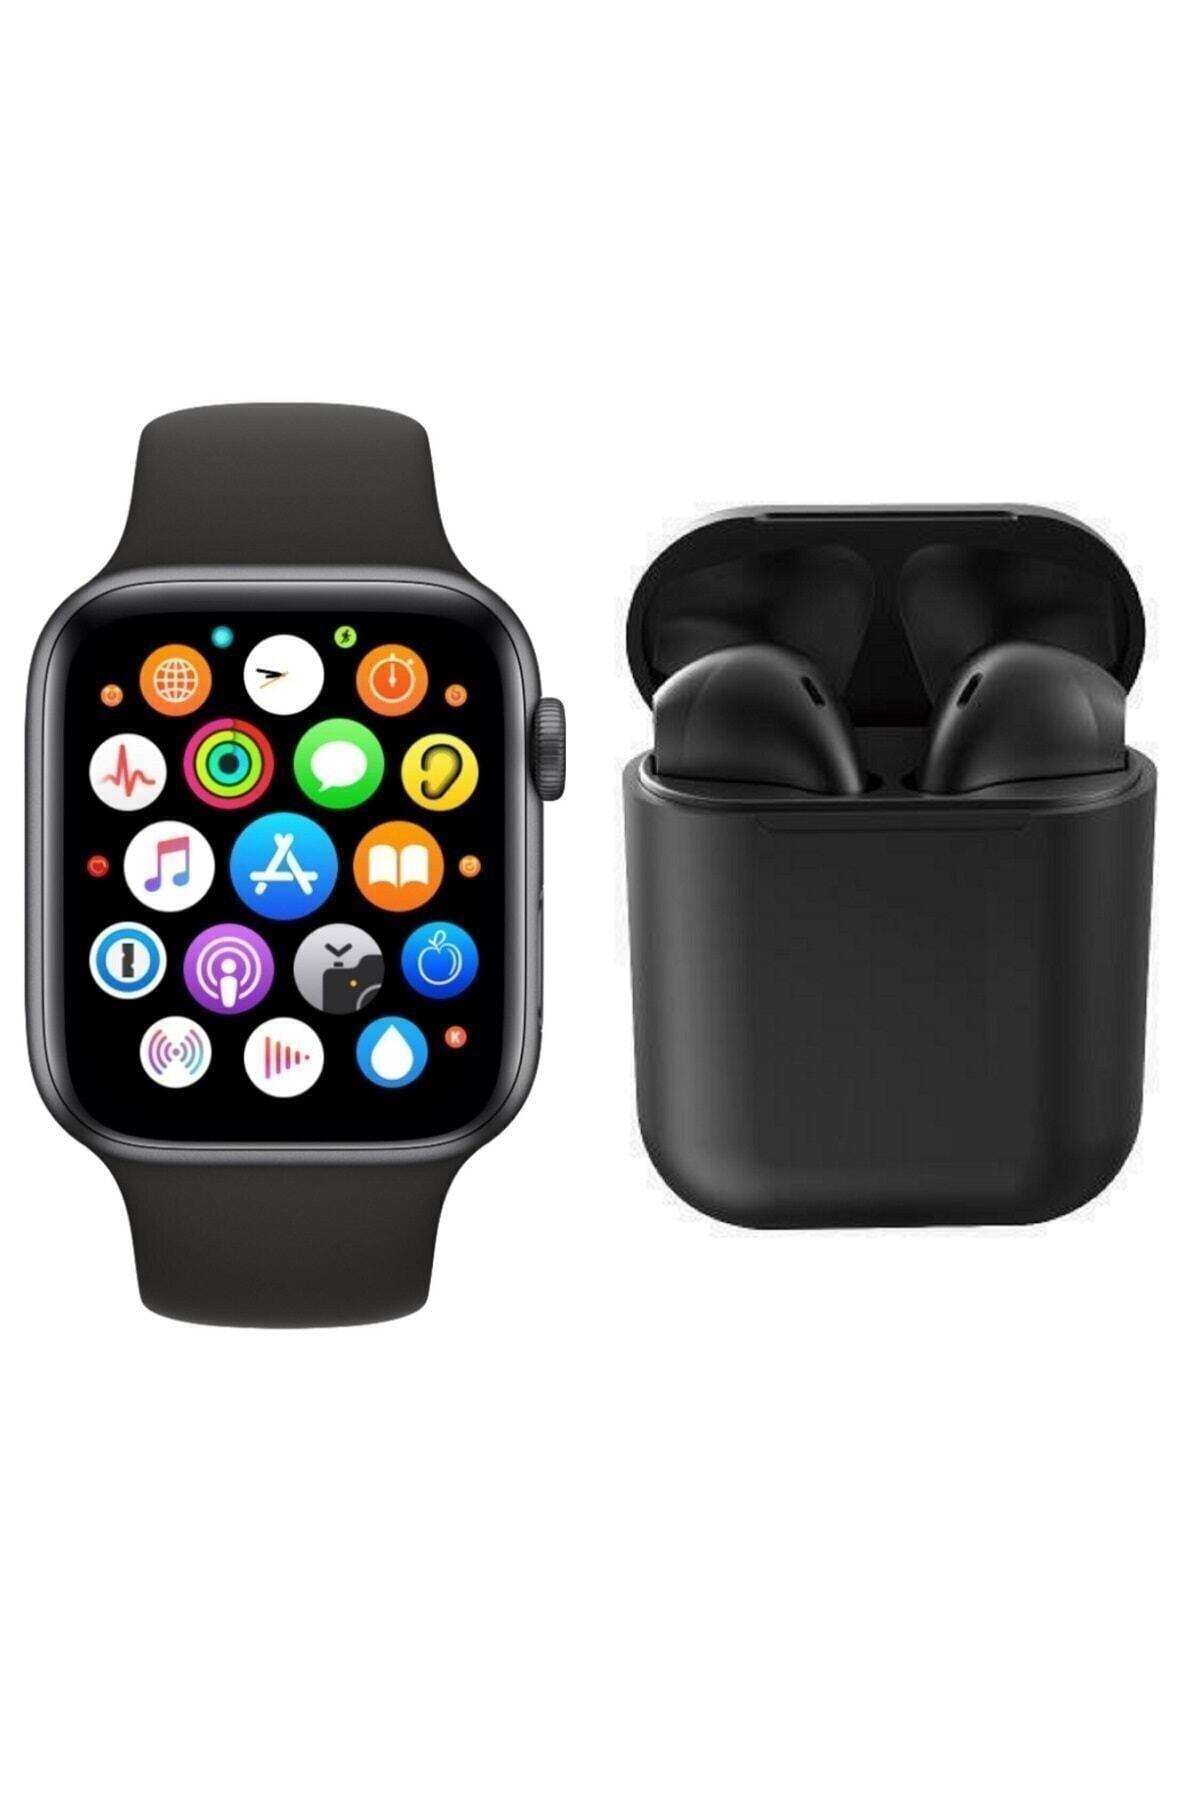 RPM BİLİŞİM Smart Watch + Airpods 12 Siyah Tws Kablosuz Kulaklık İkili Kombin T500 1